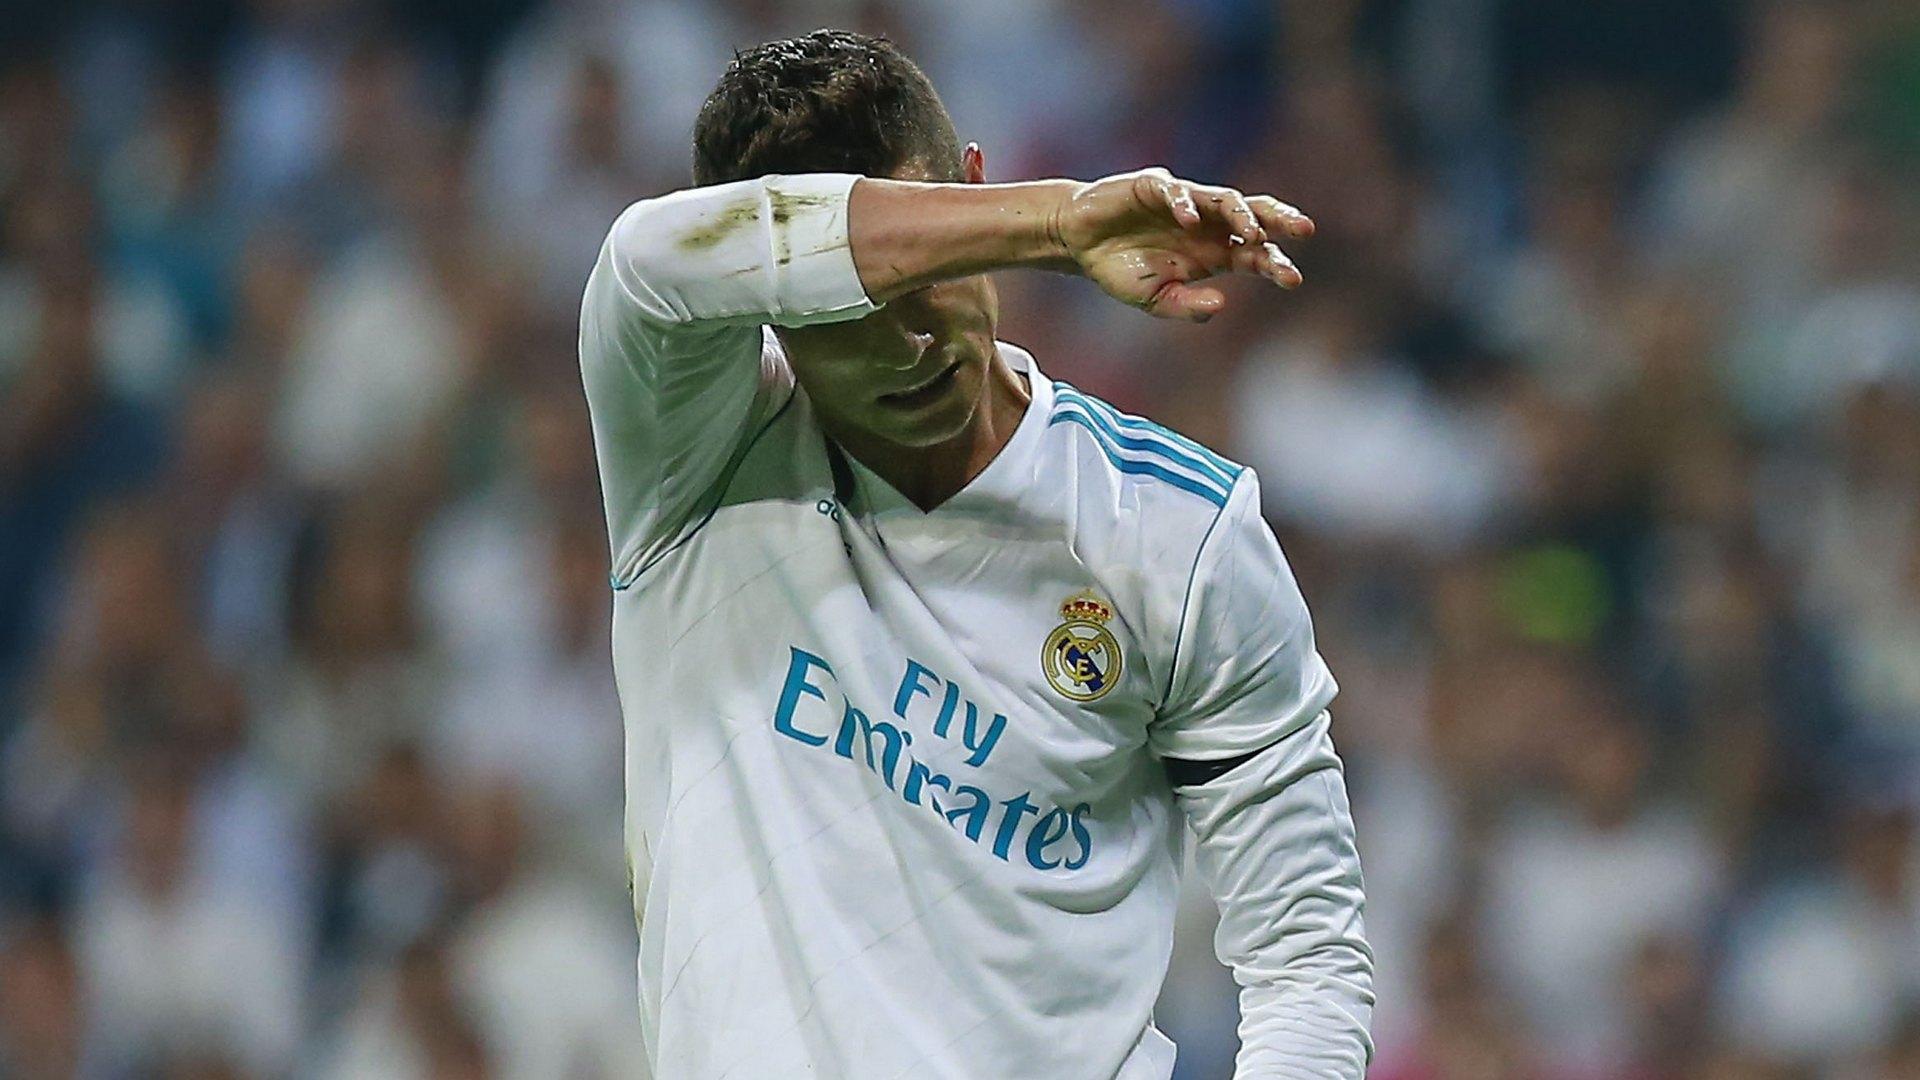 Cristiano-ronaldo-real-madrid-la-liga-09212017_72e0js5001mb1w7y32mehy71f